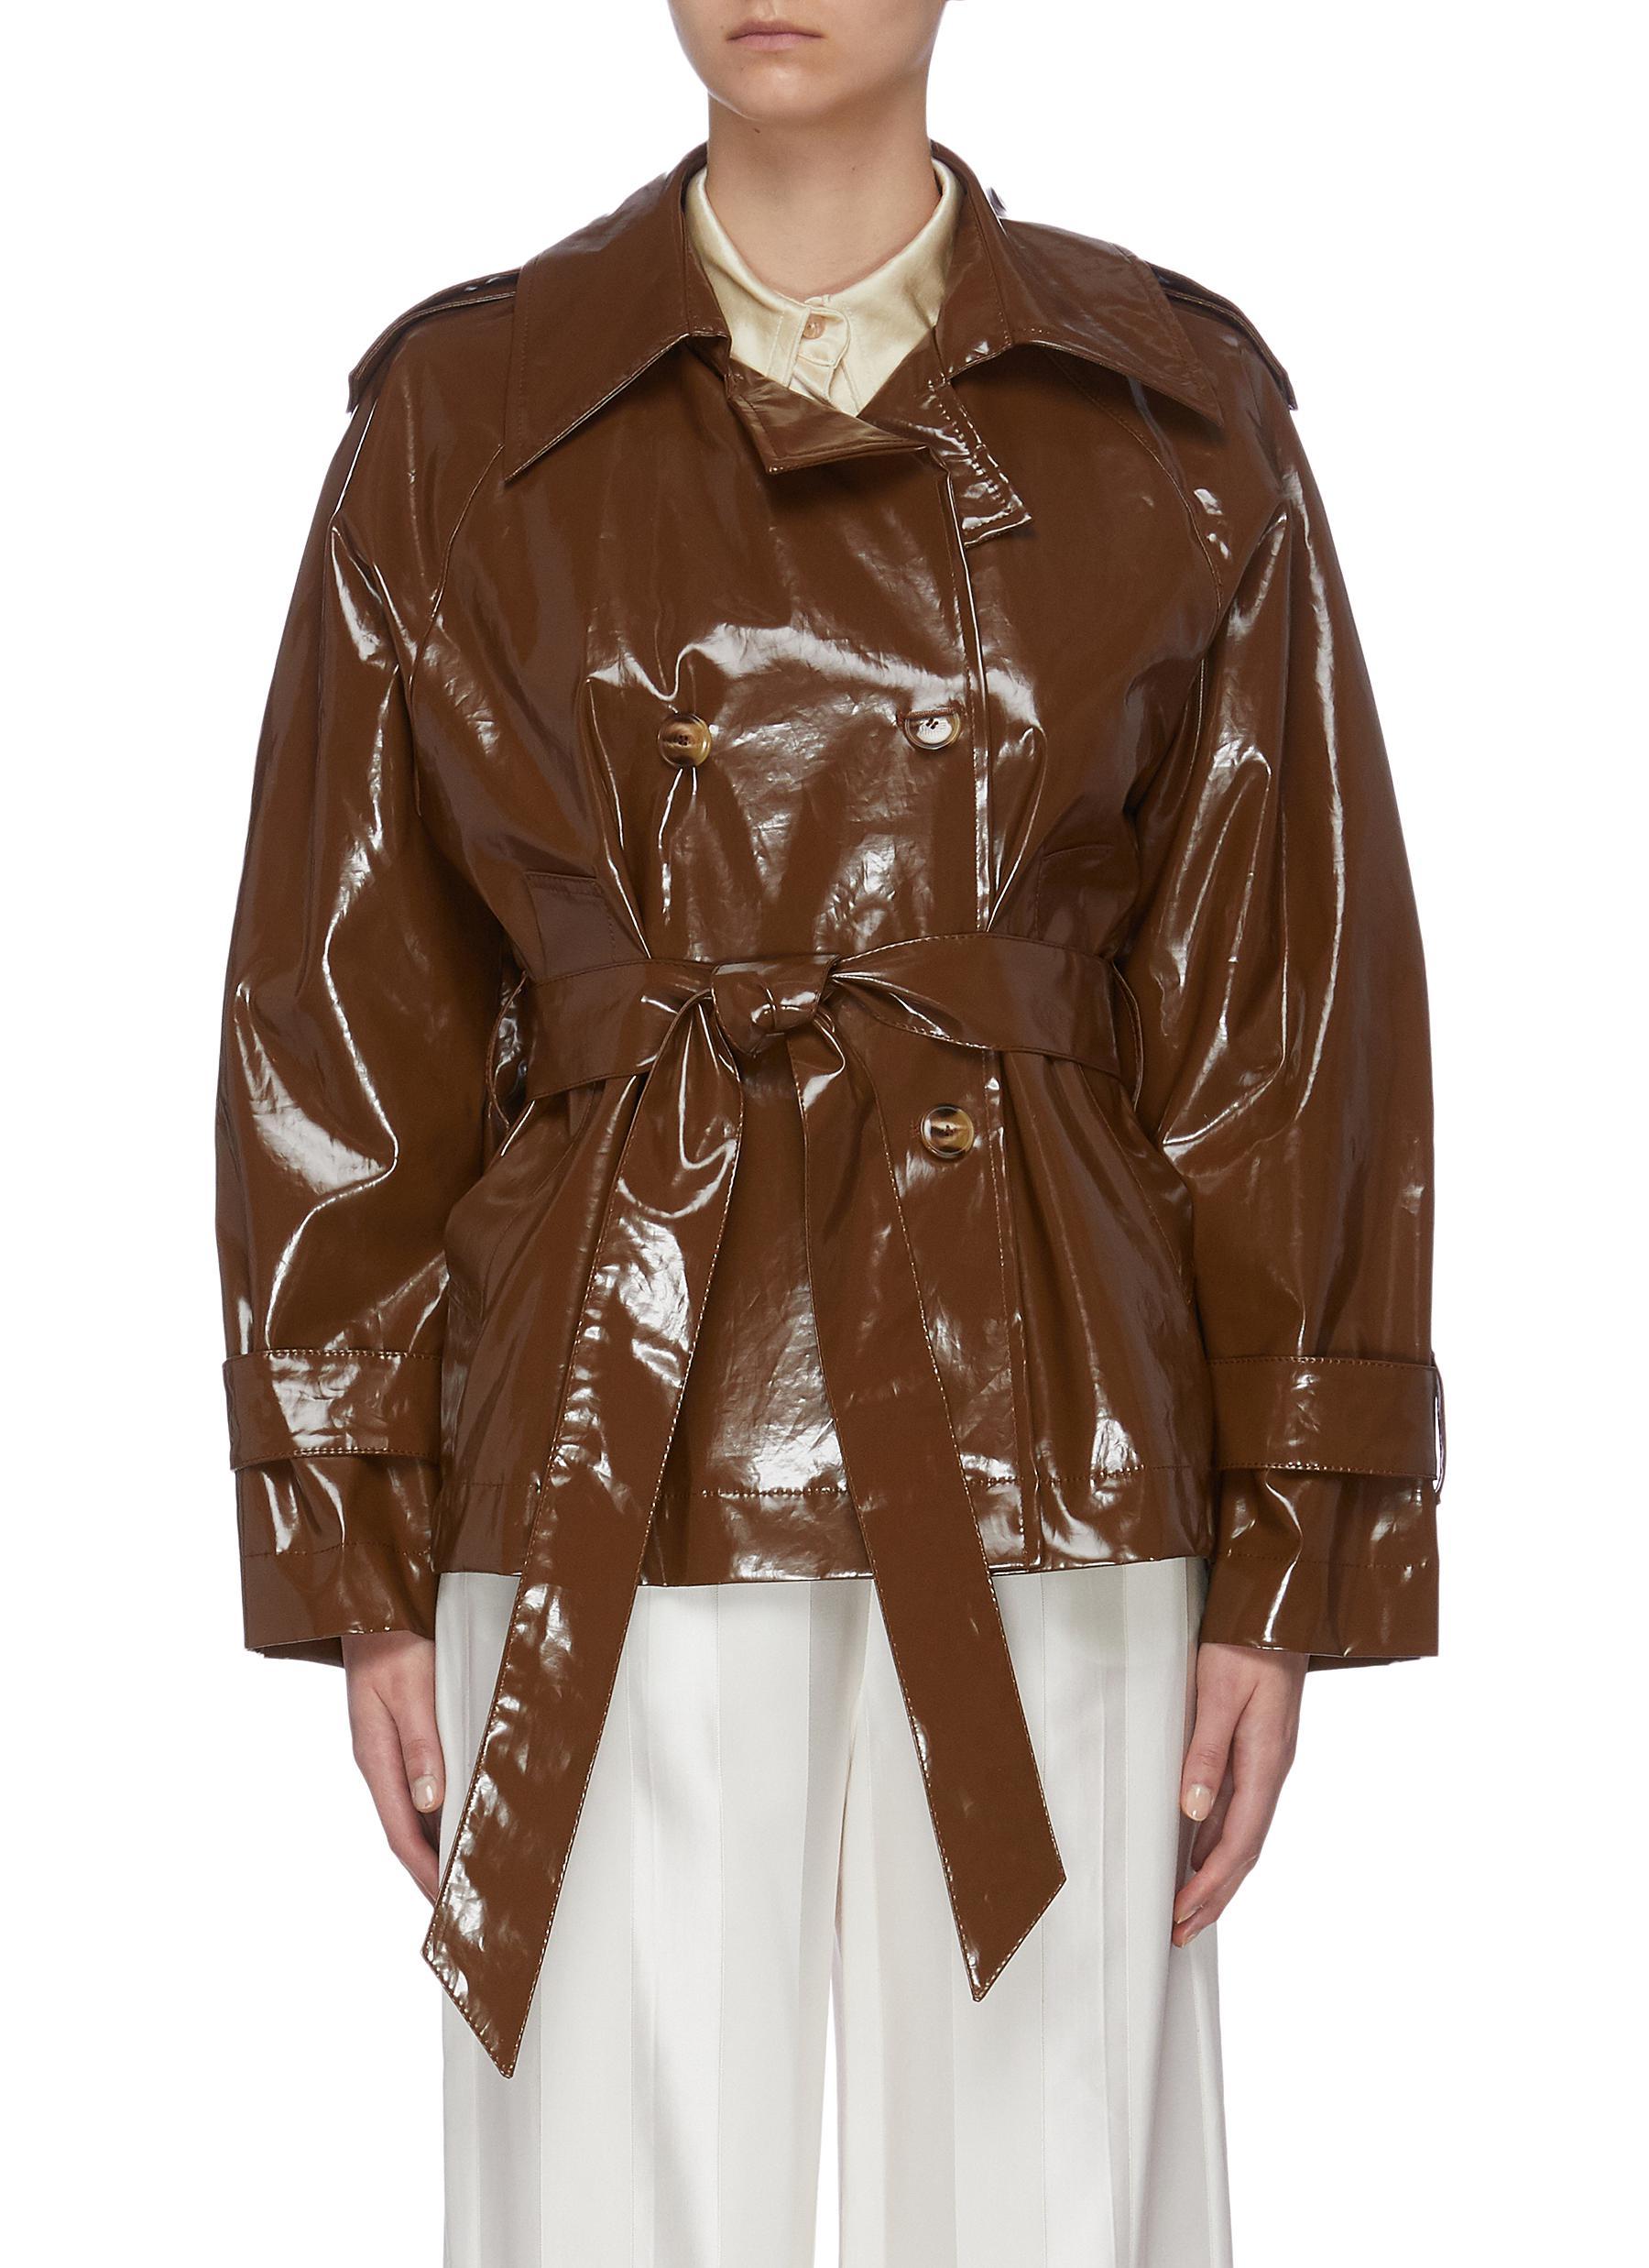 Buy Nanushka Jackets 'Biel' Crop Trench Jacket